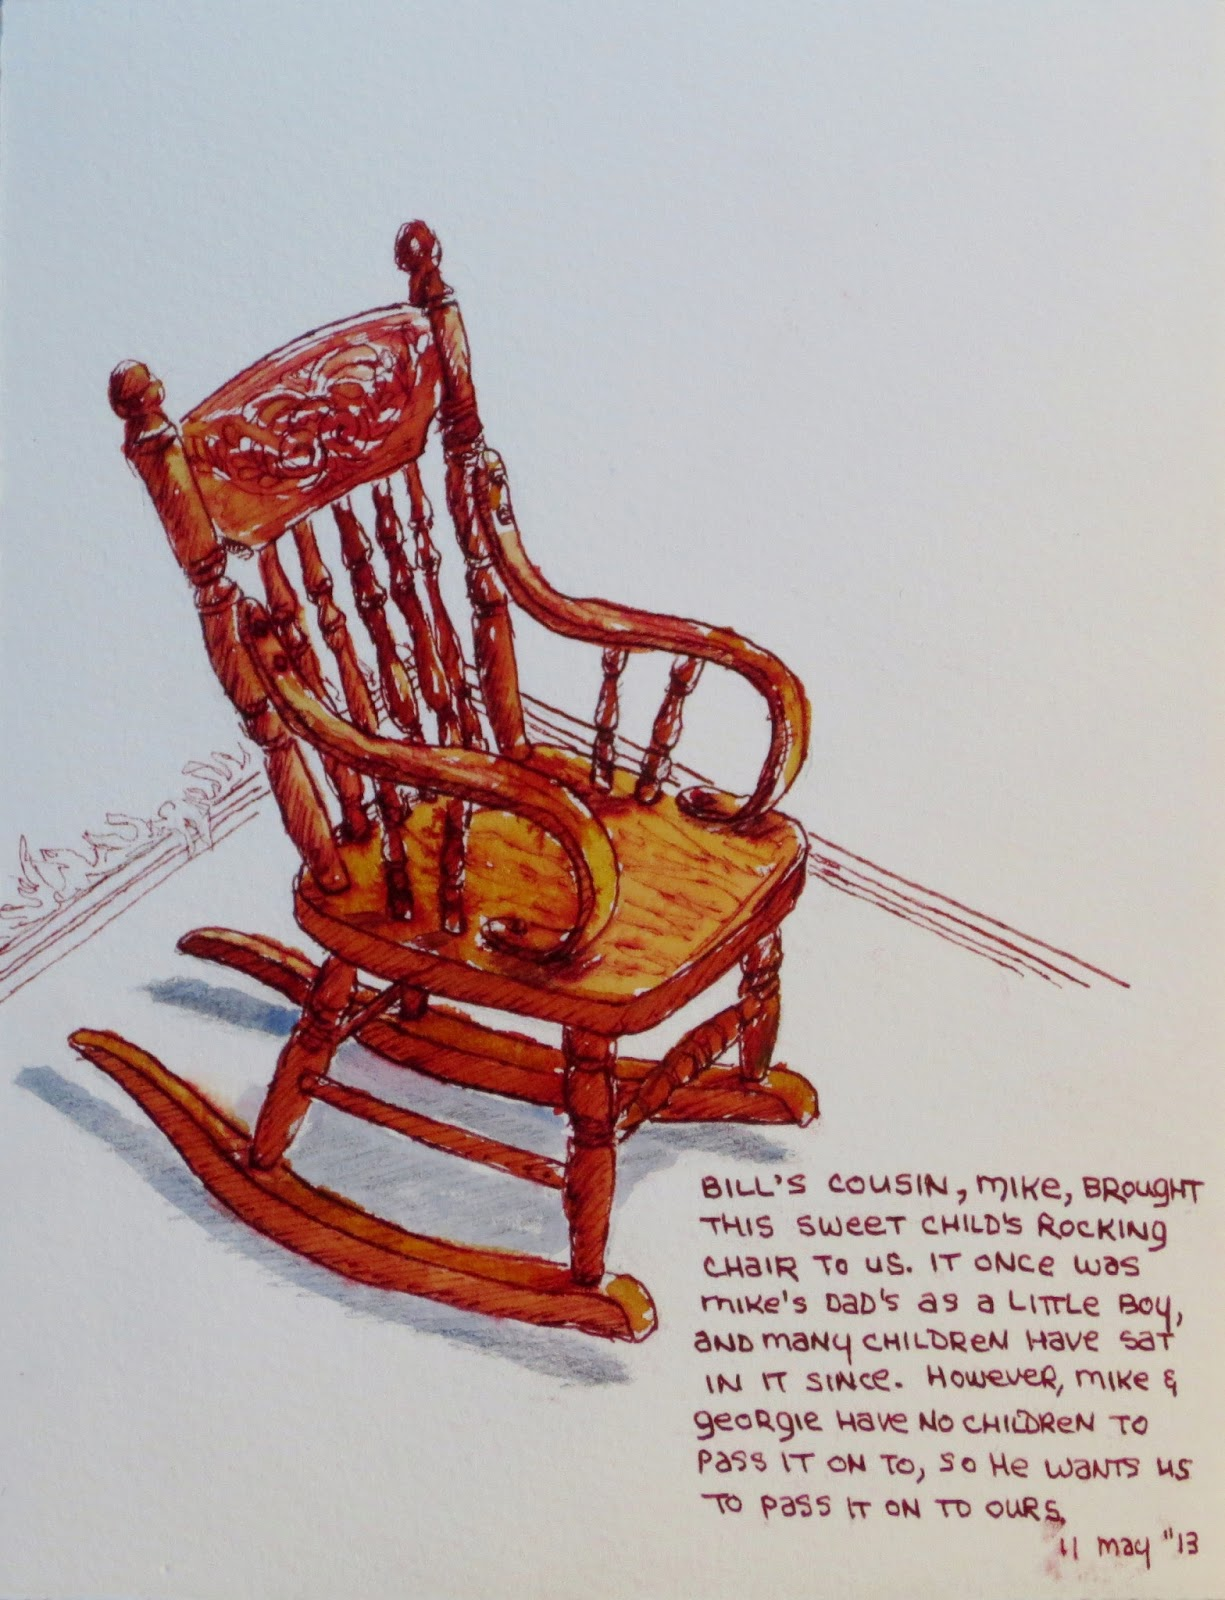 Grandma Rocking Chair Wrought Iron Patio Glides Vicky L Williamson W 39s